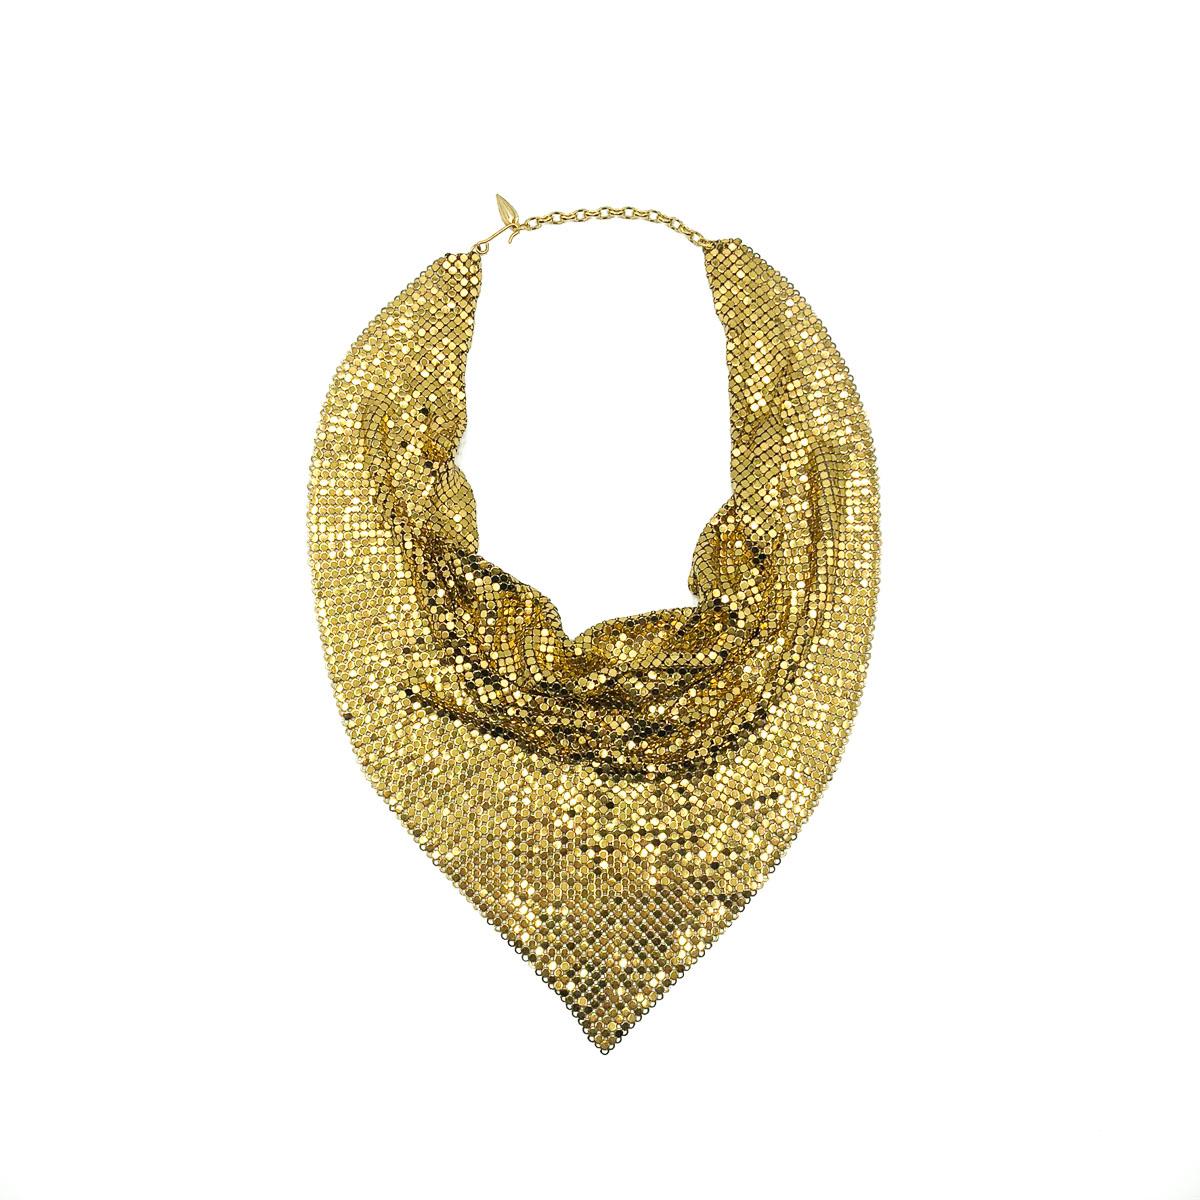 Details about  /Vintage Designer Whiting /& Davis Egyptian Revival Necklace